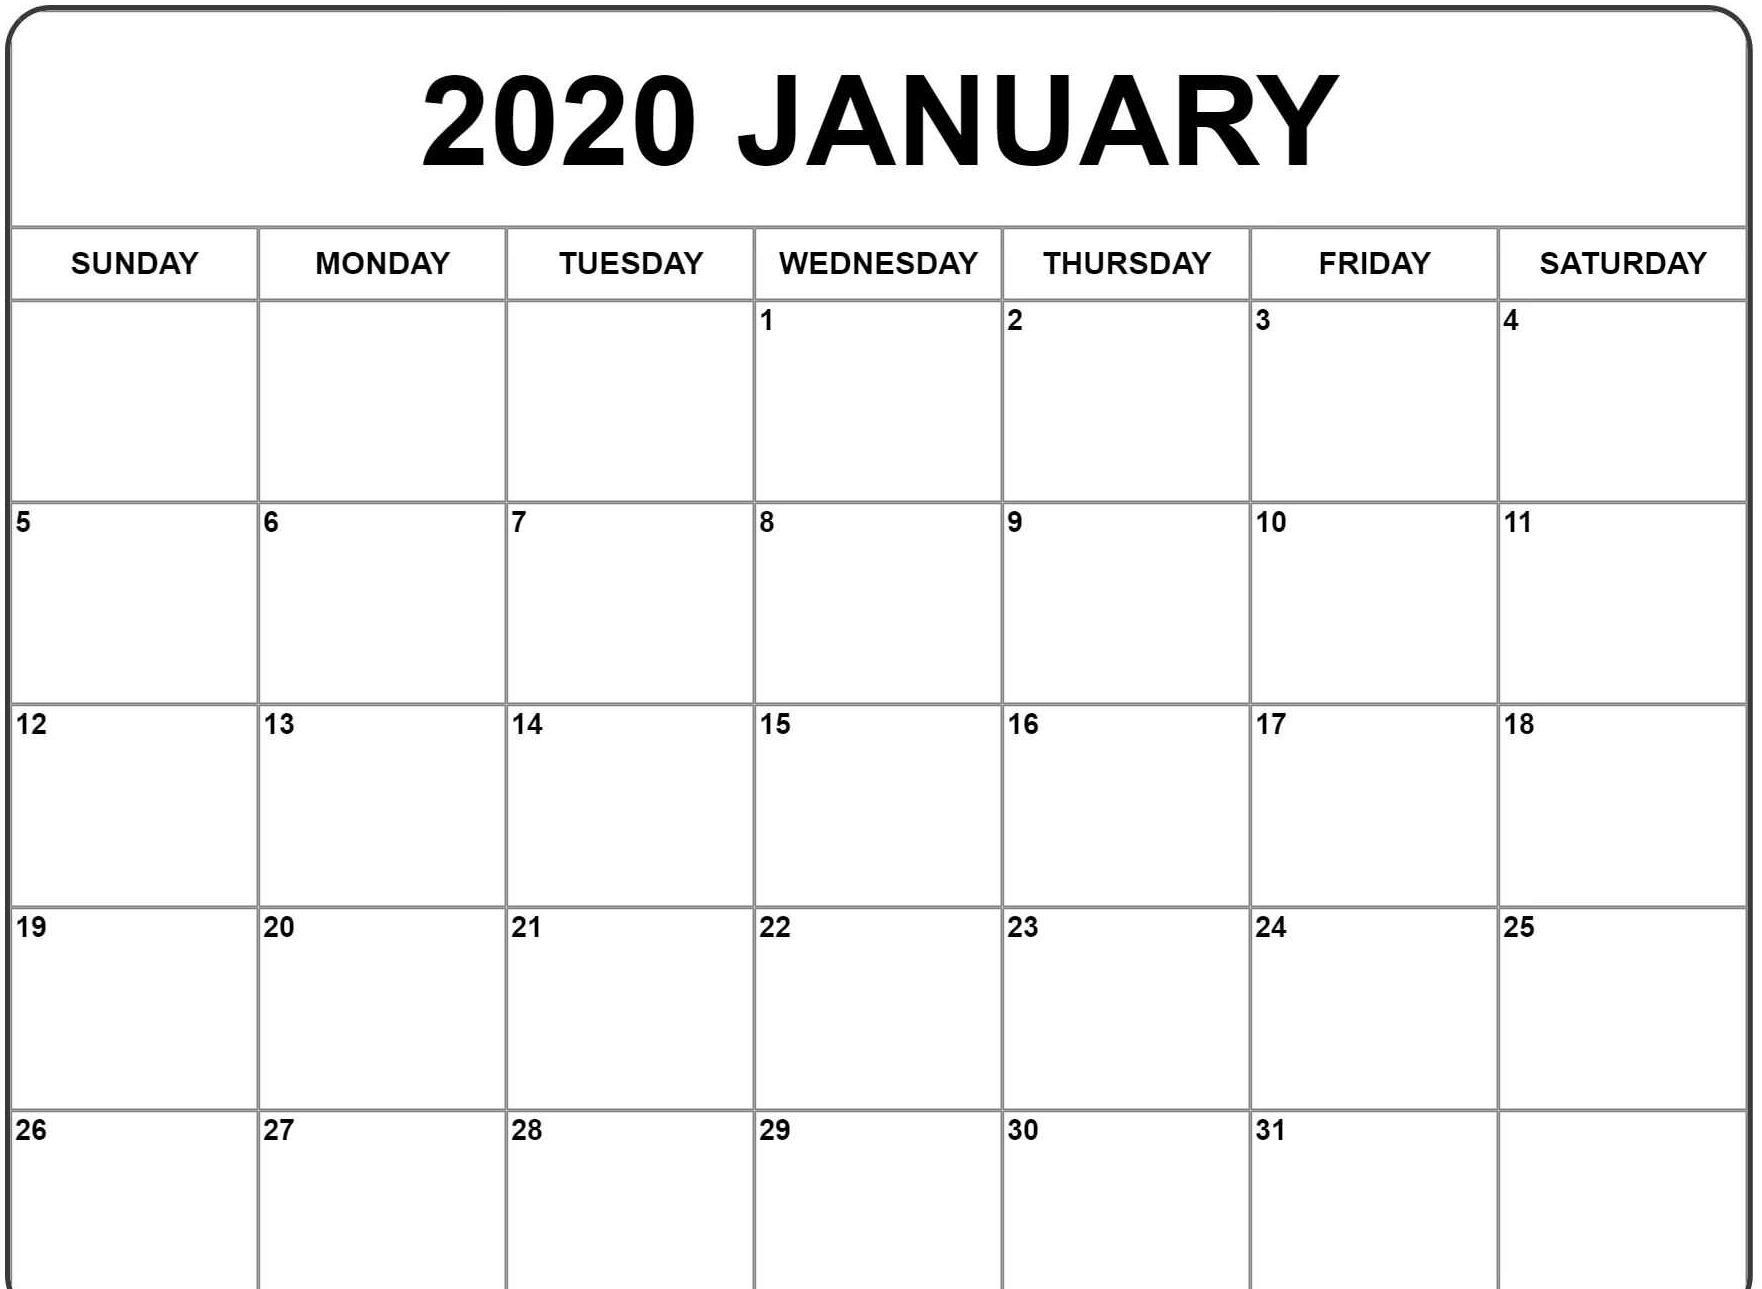 January Calendar 2020